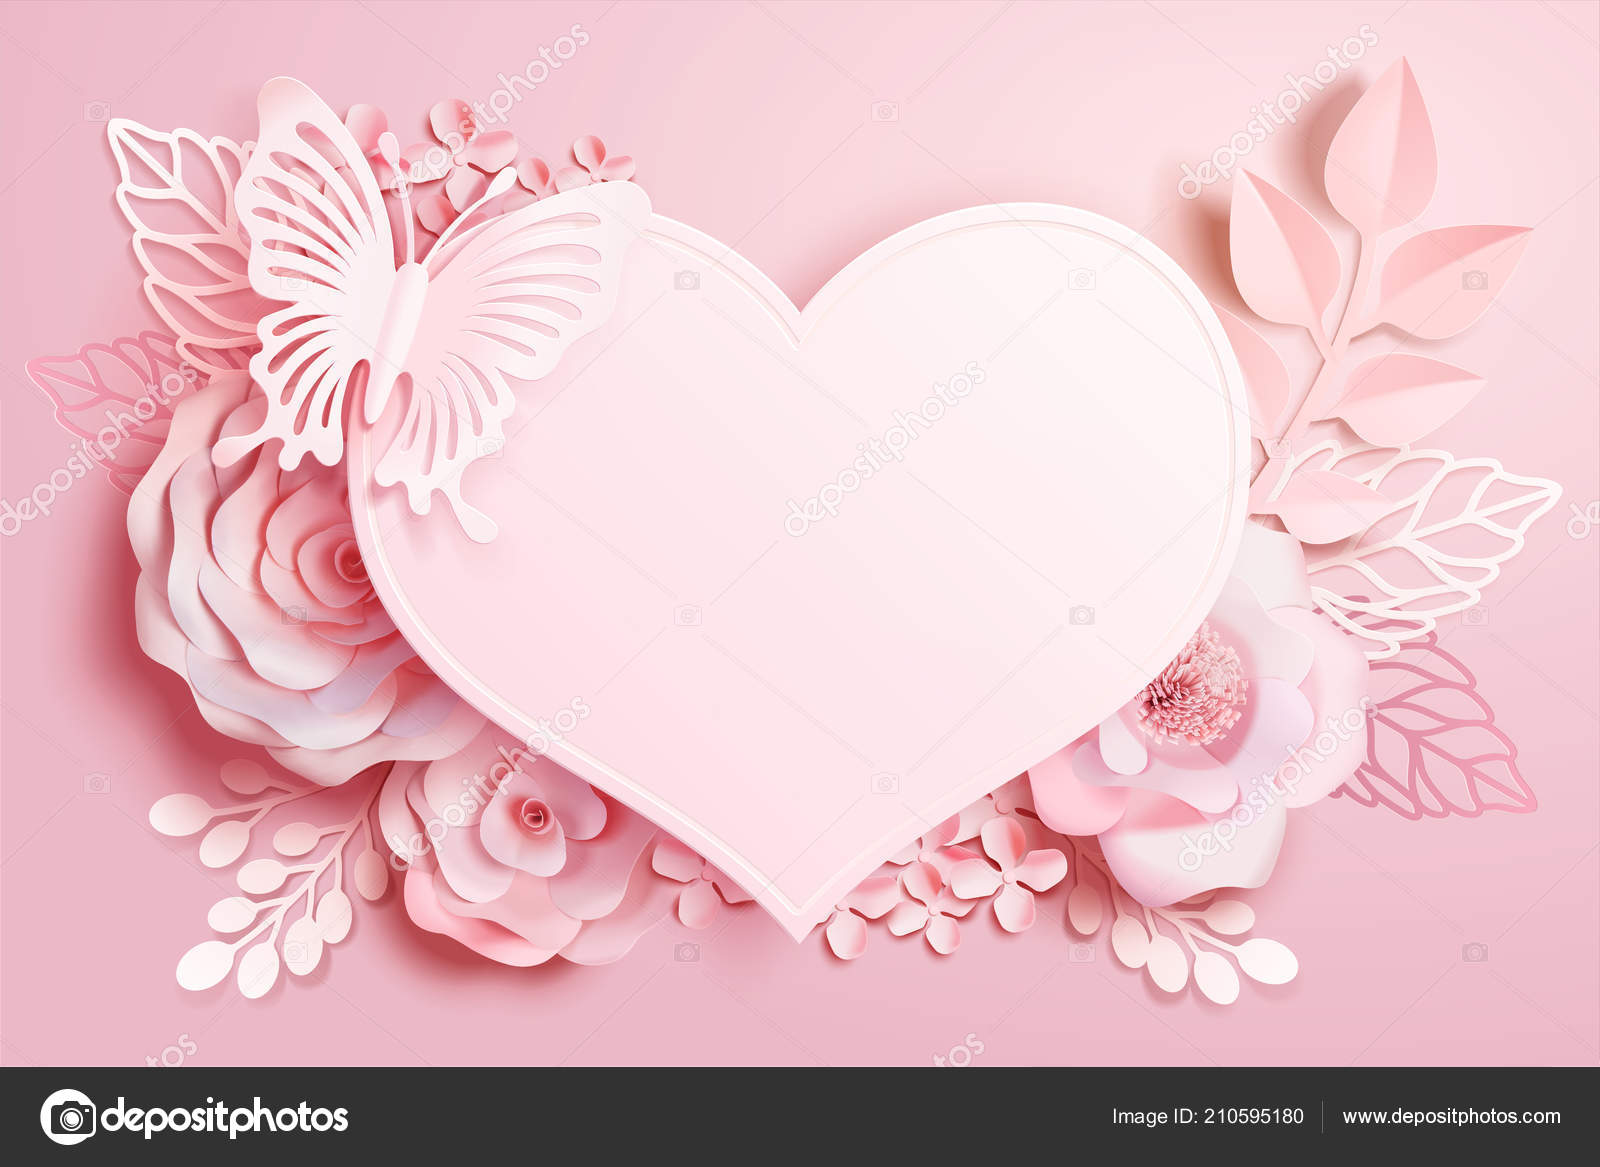 Romantic Floral Paper Art Heart Shape Butterfly Pink Tone